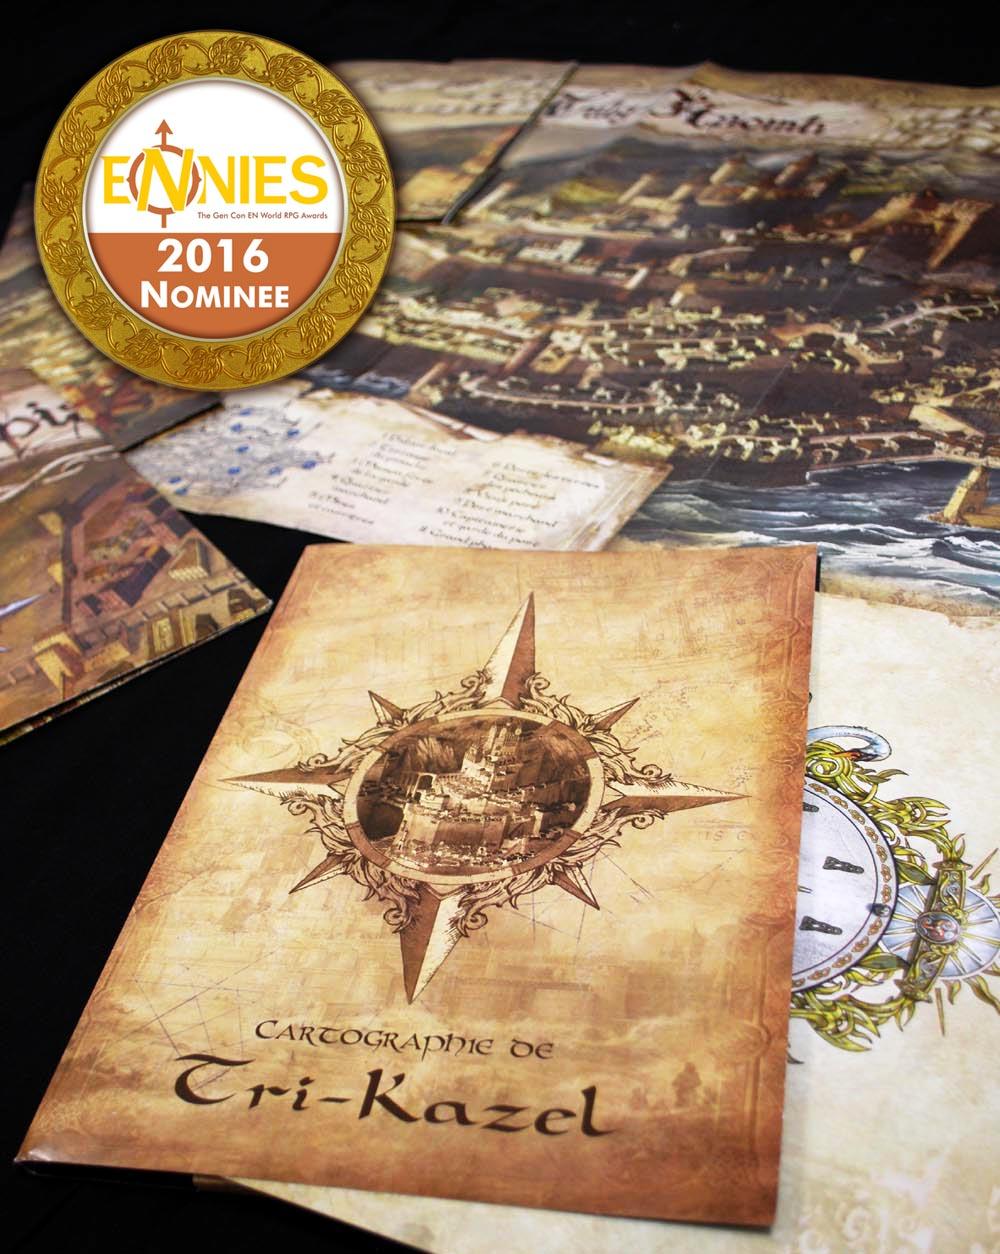 ENNIE Award winning supplement Cartography of Tri-Kazel Shadows of Esteren